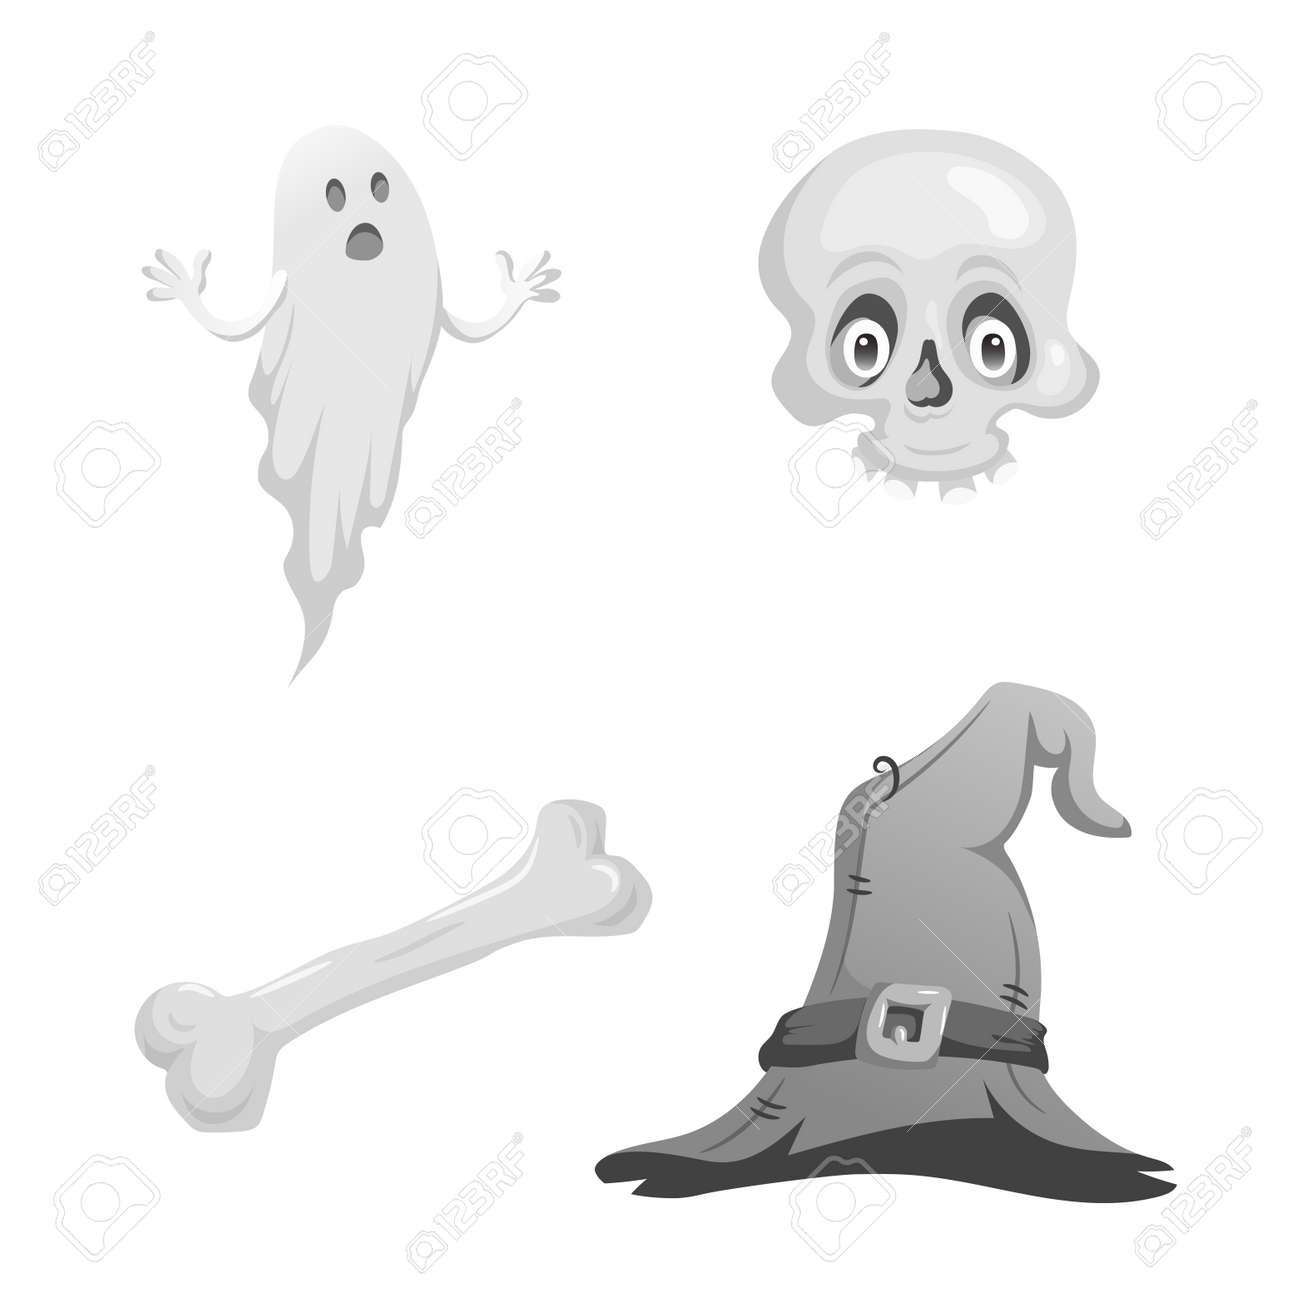 Cartoon Monochrome Halloween Symbols Set  Funny Ghost, Skull